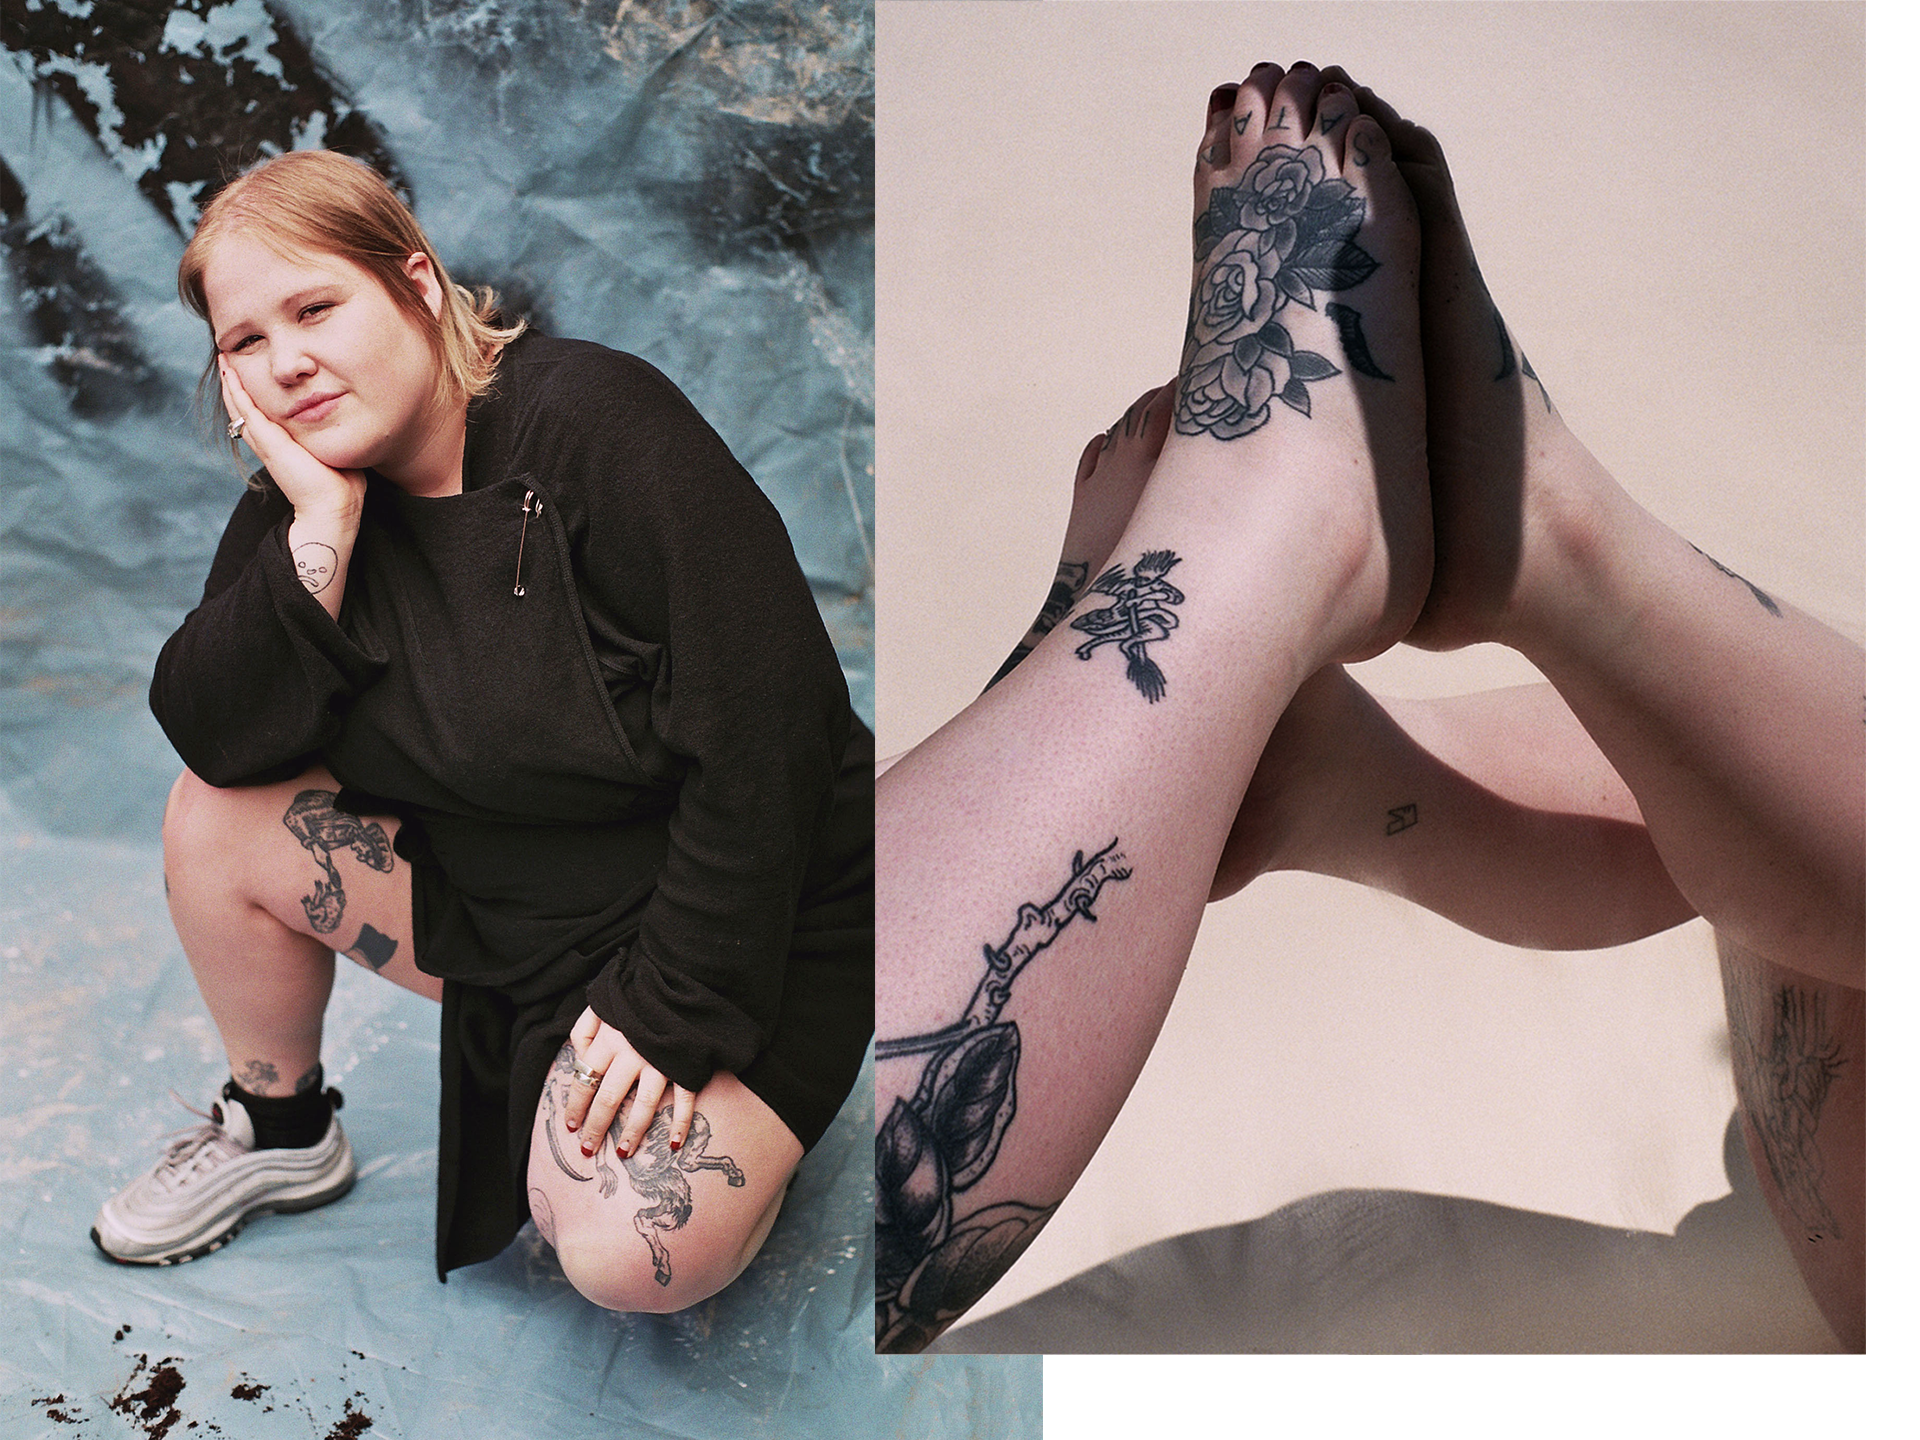 Cardi B Leg Tat: Tattoo Meaning Young Women Trend Body Image Photos